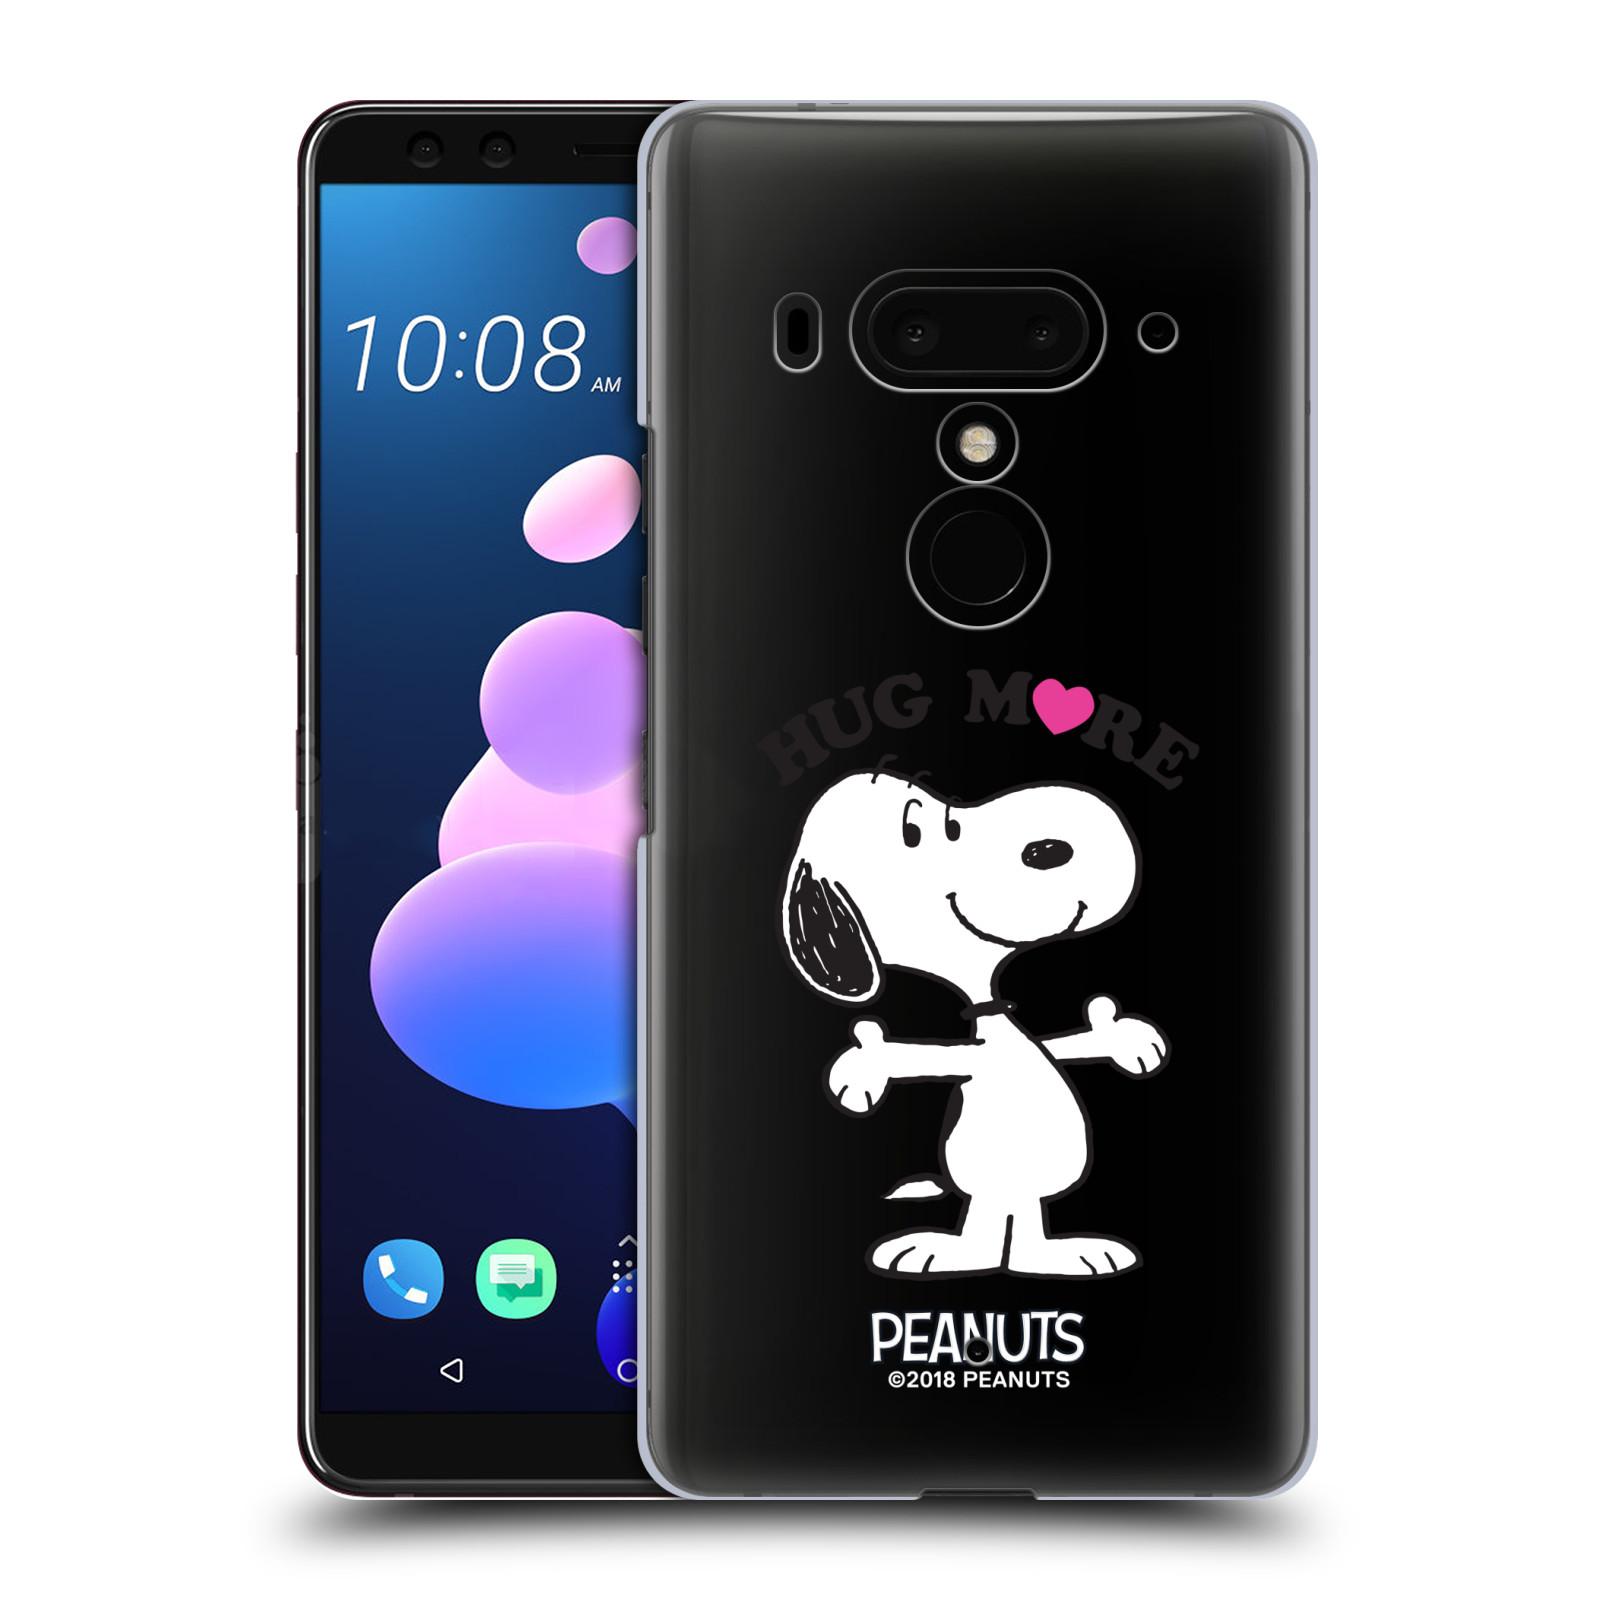 Pouzdro na mobil HTC U 12 PLUS / U 12+ DUAL SIM Oficiální motiv Peanuts pejsek Snoopy srdíčko